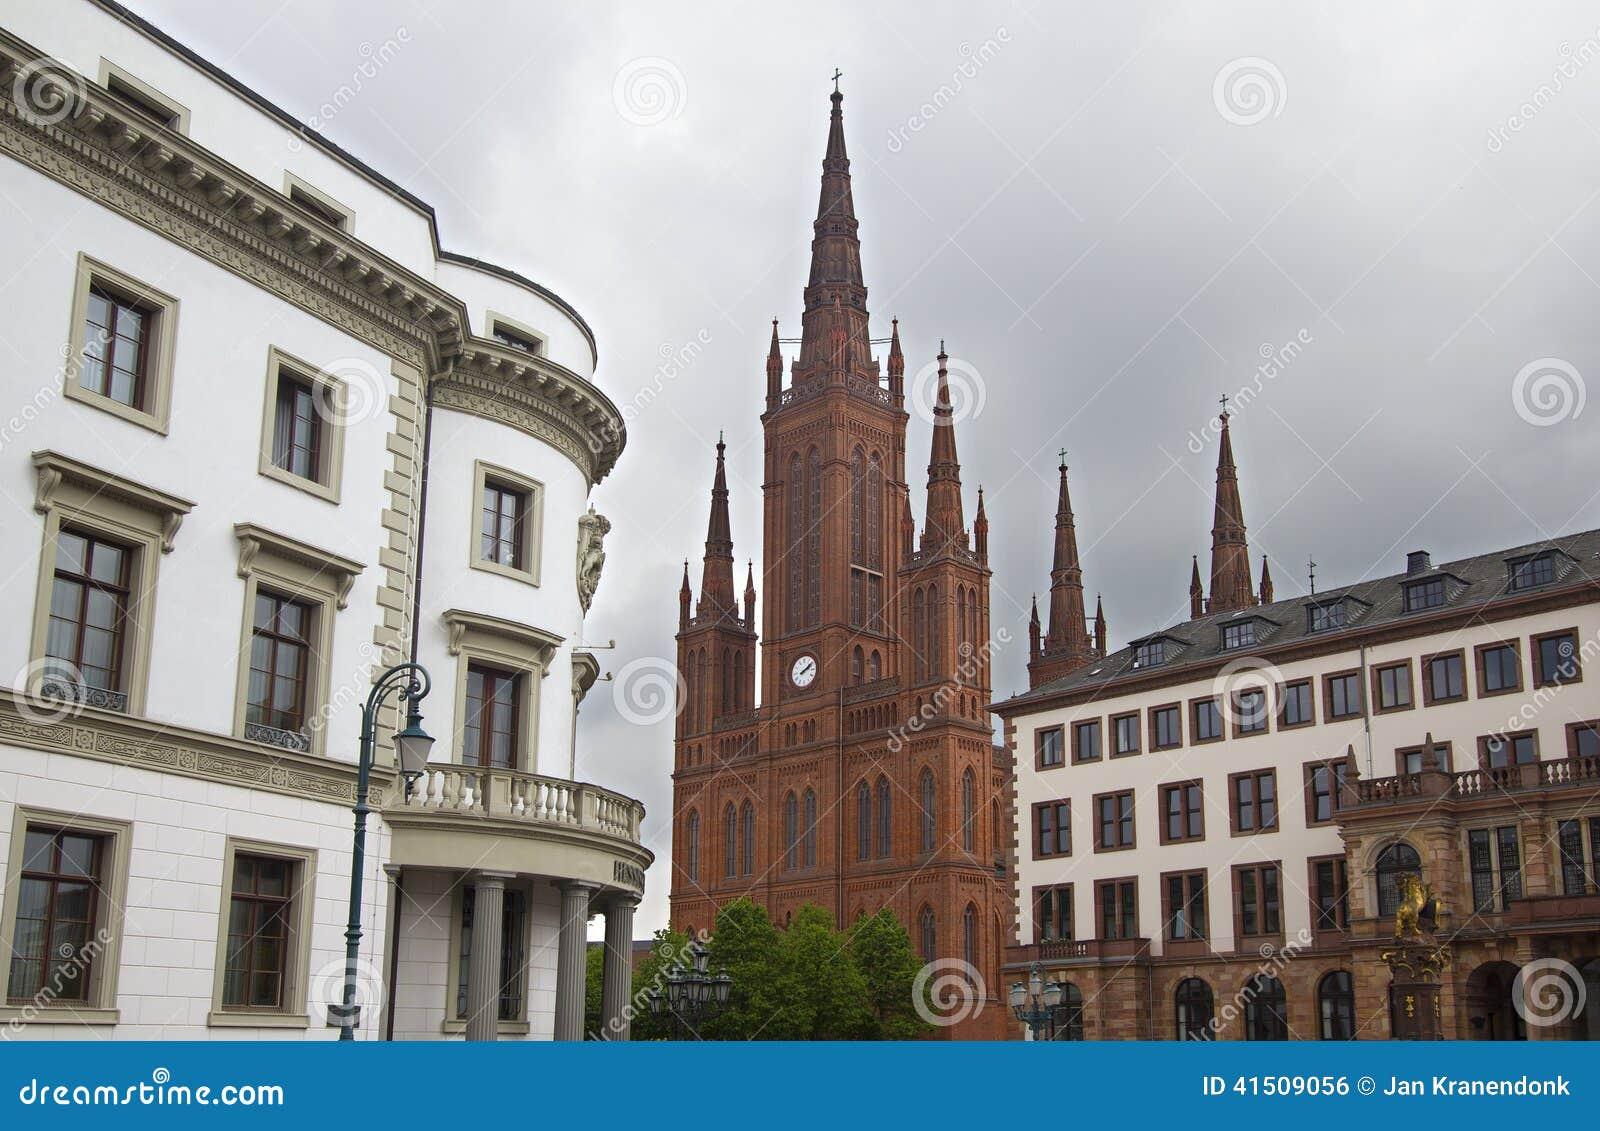 Germany Wiesbaden